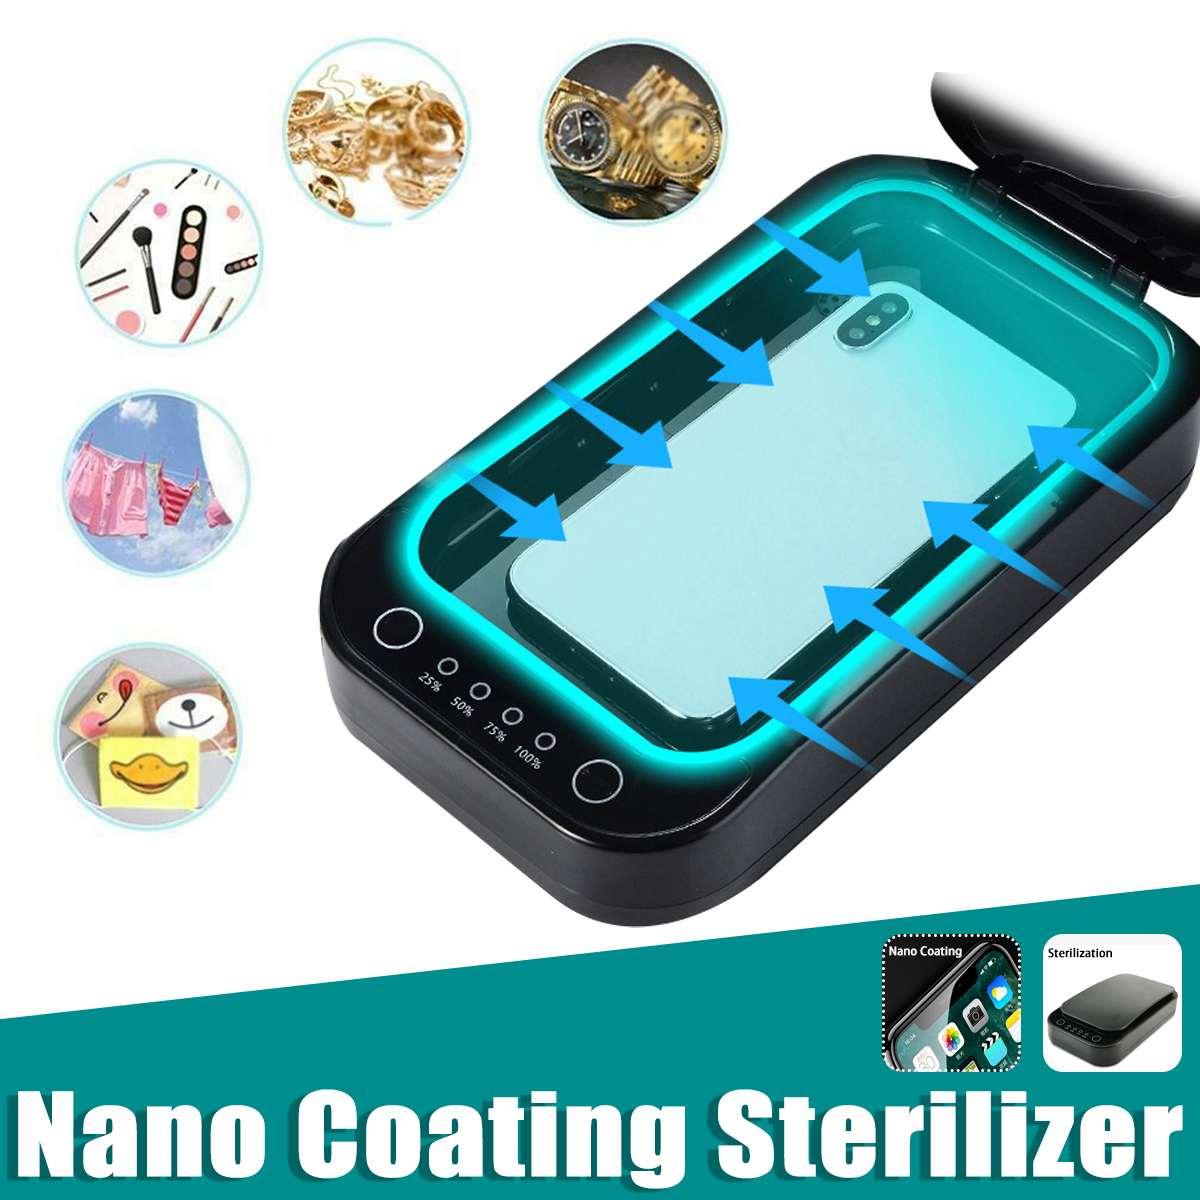 Multifunctional Coating Machine Tempered Film Coating Machine Sterilizer Mobile Phone Liquid Screen Protector mobile accessory